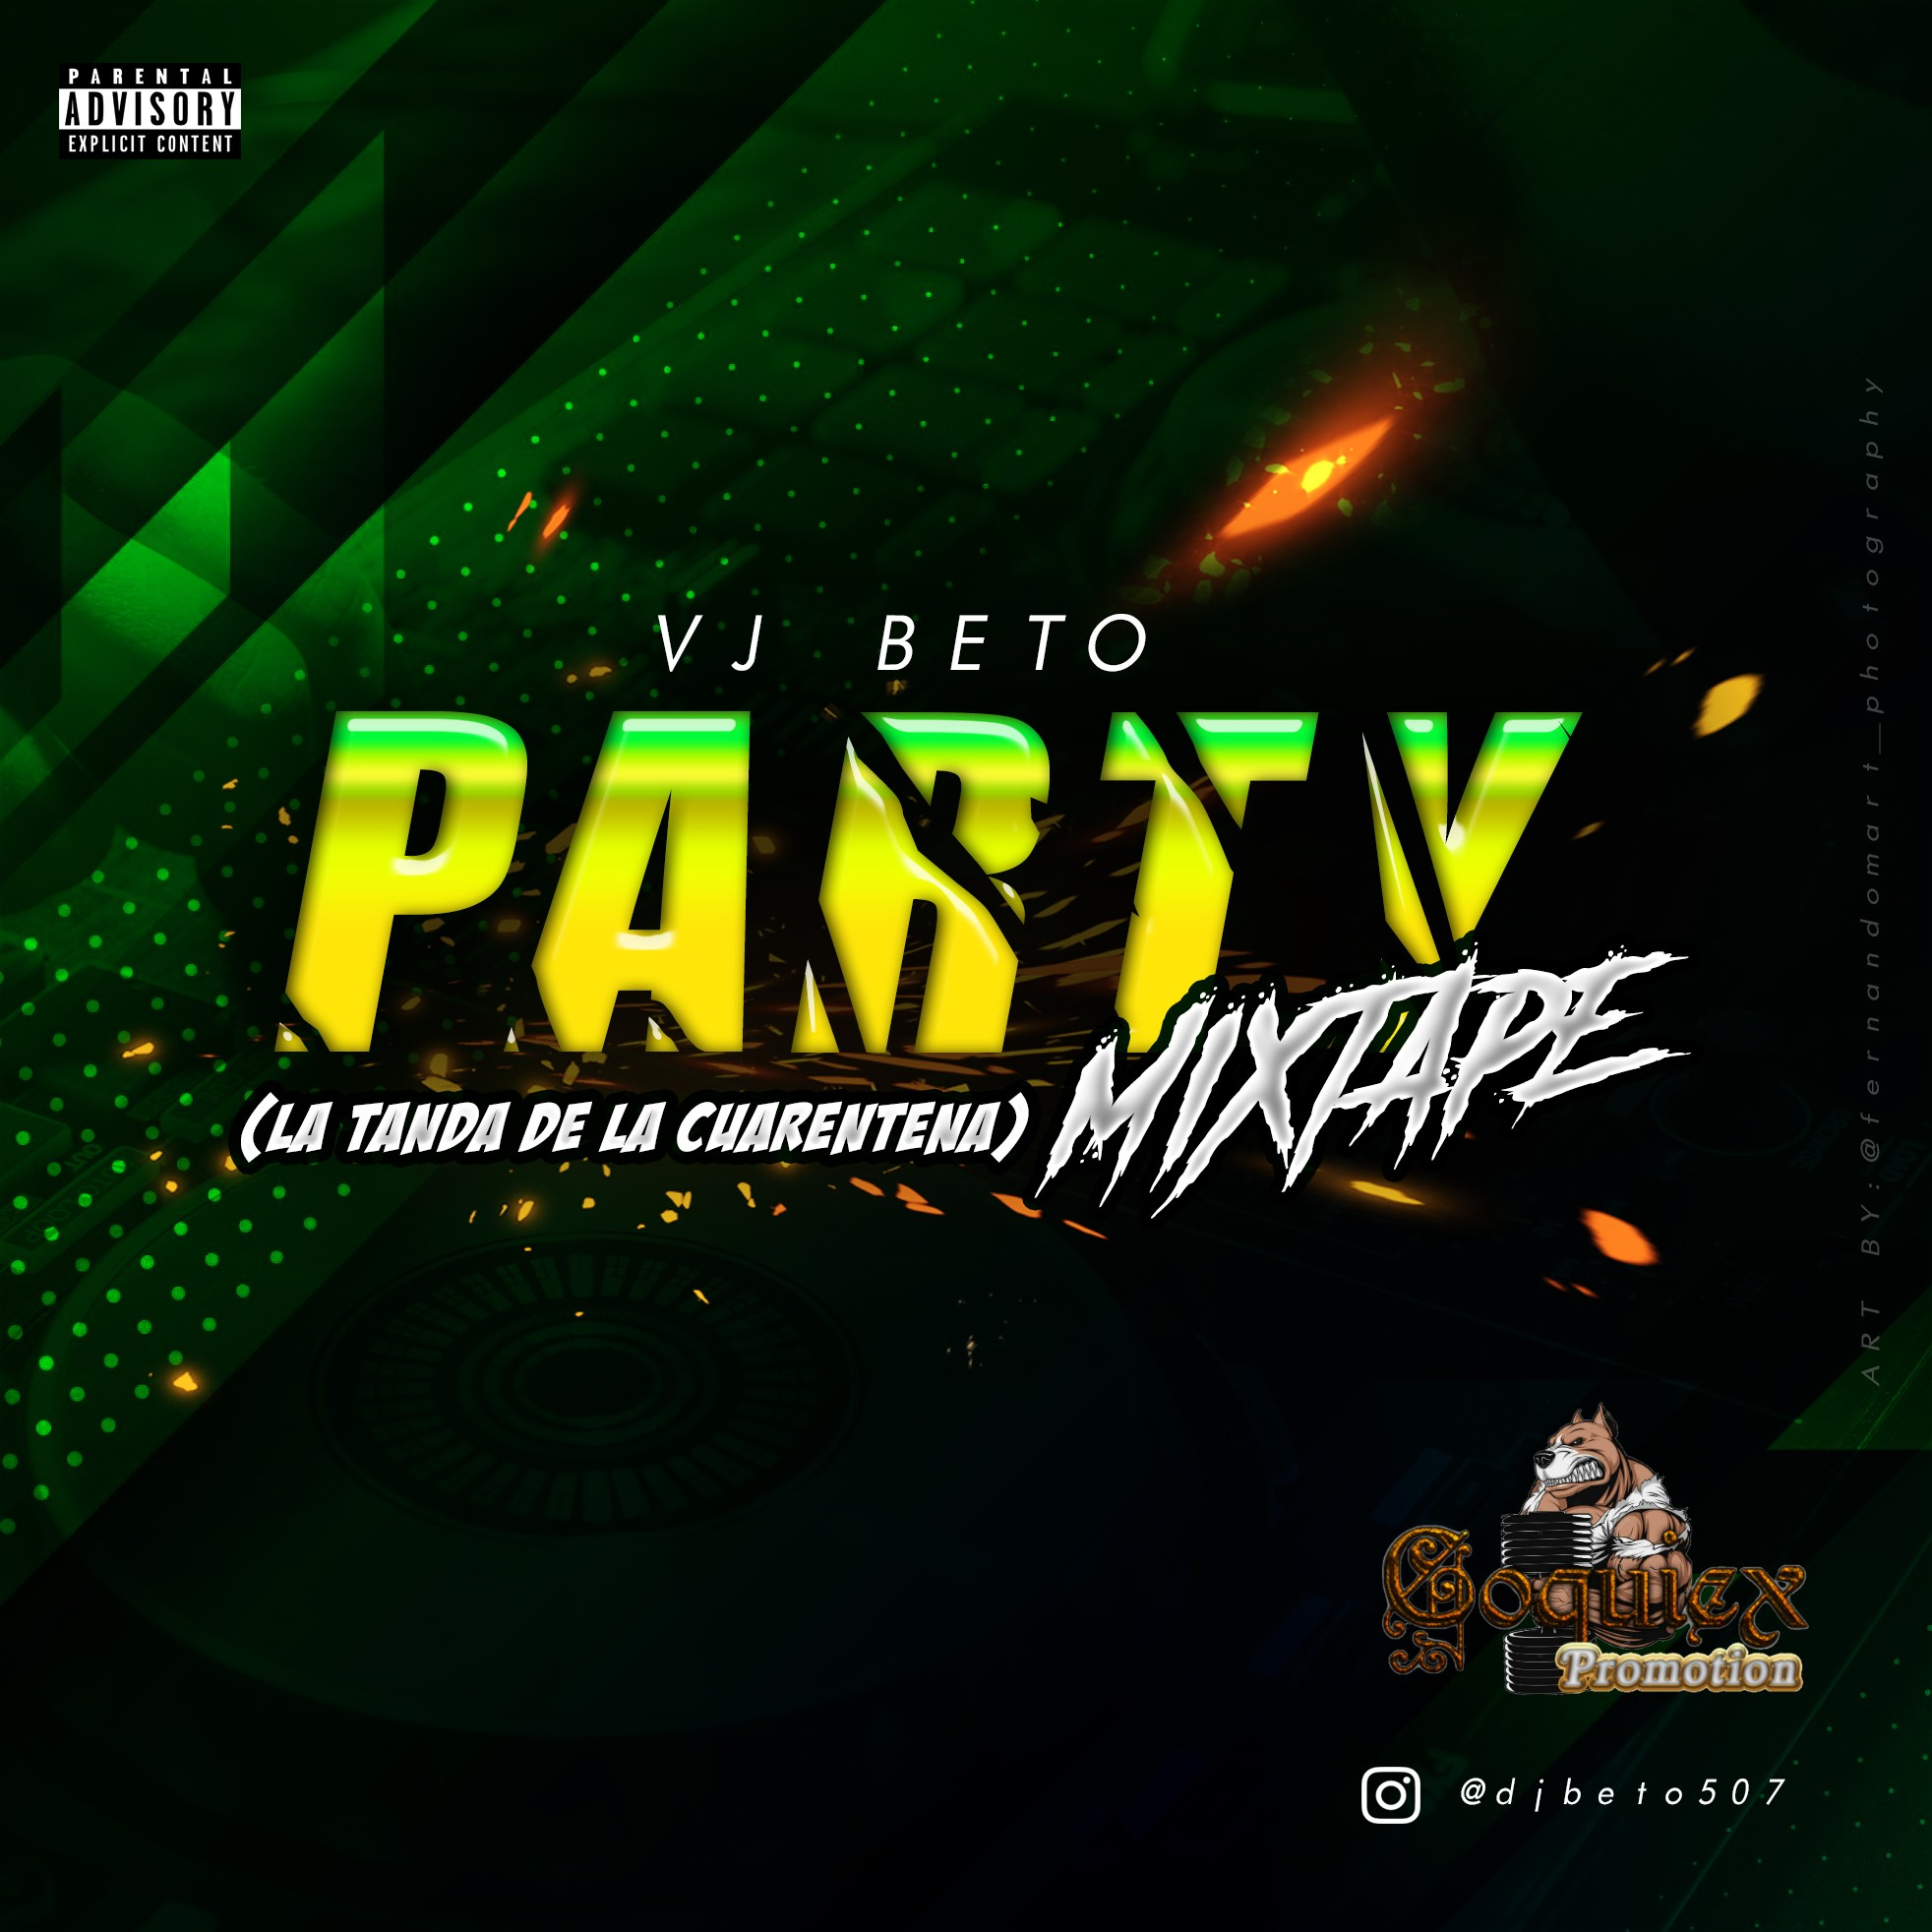 Vj Beto - Party Mixtape (La Tanda de la Cuarentena)